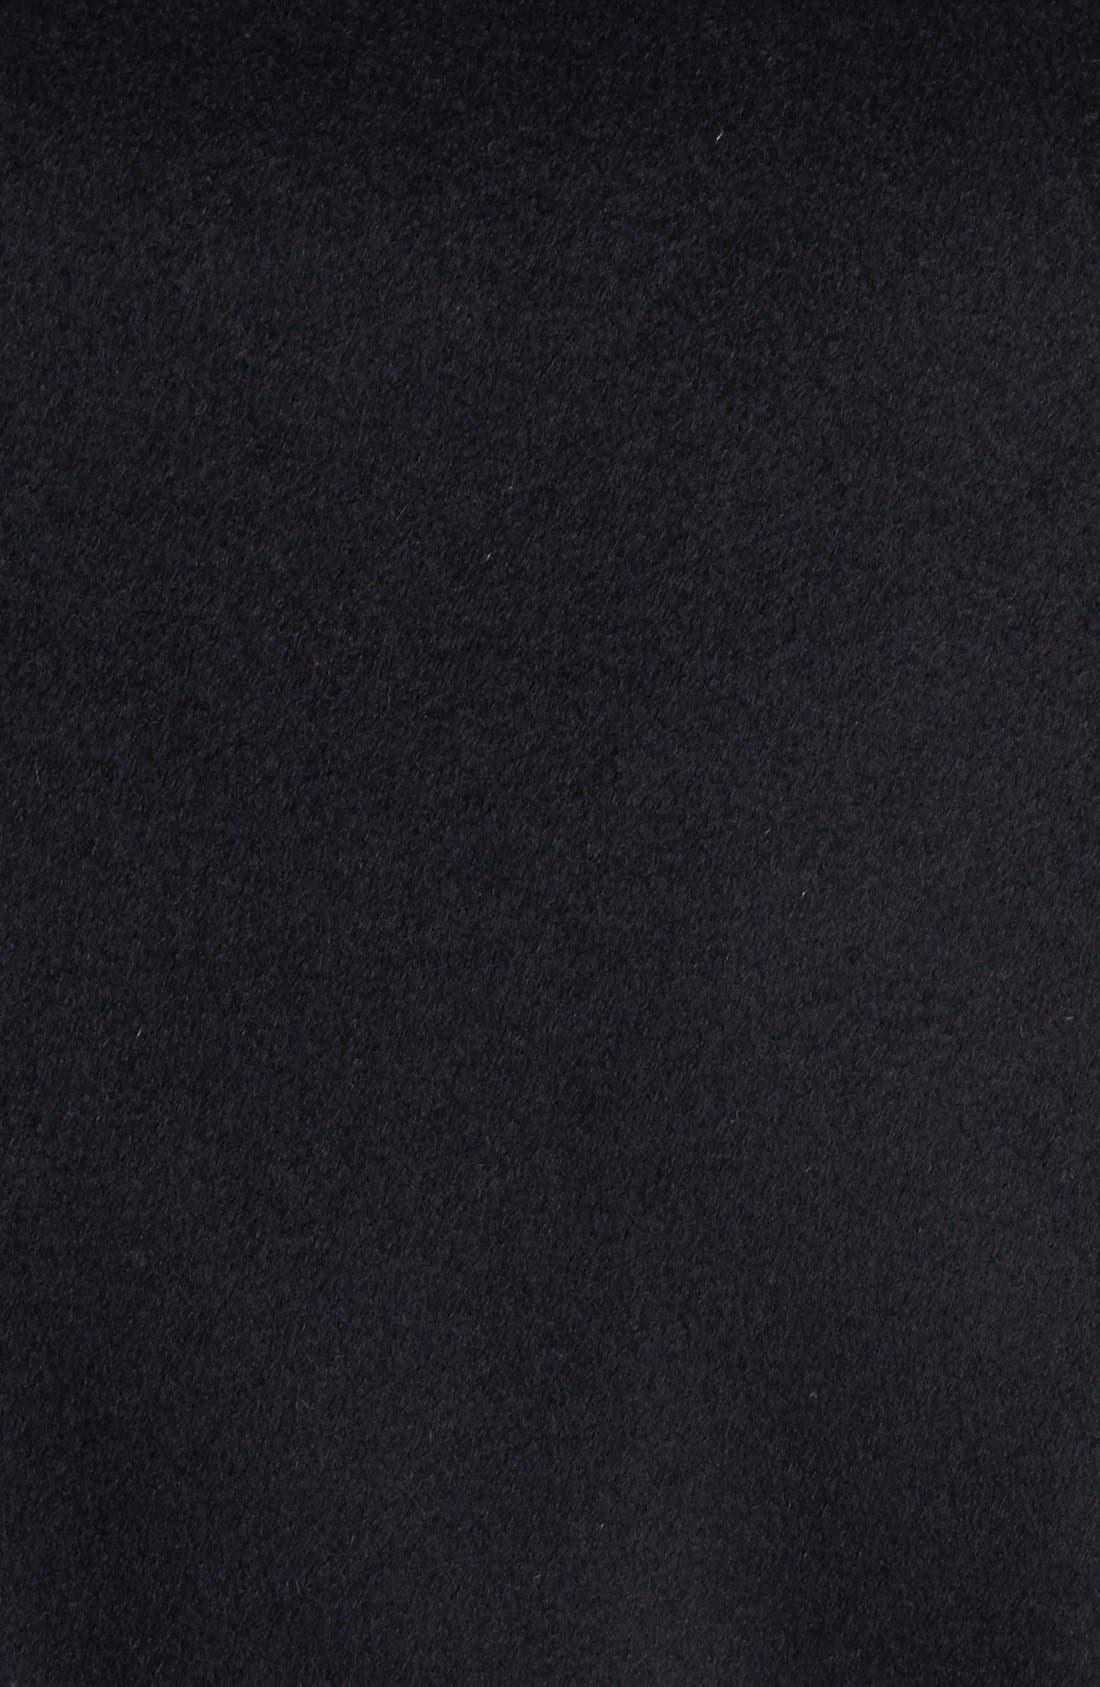 BOSS HUGO BOSS 'Sintrax' Wool Blend Coat,                             Alternate thumbnail 3, color,                             001